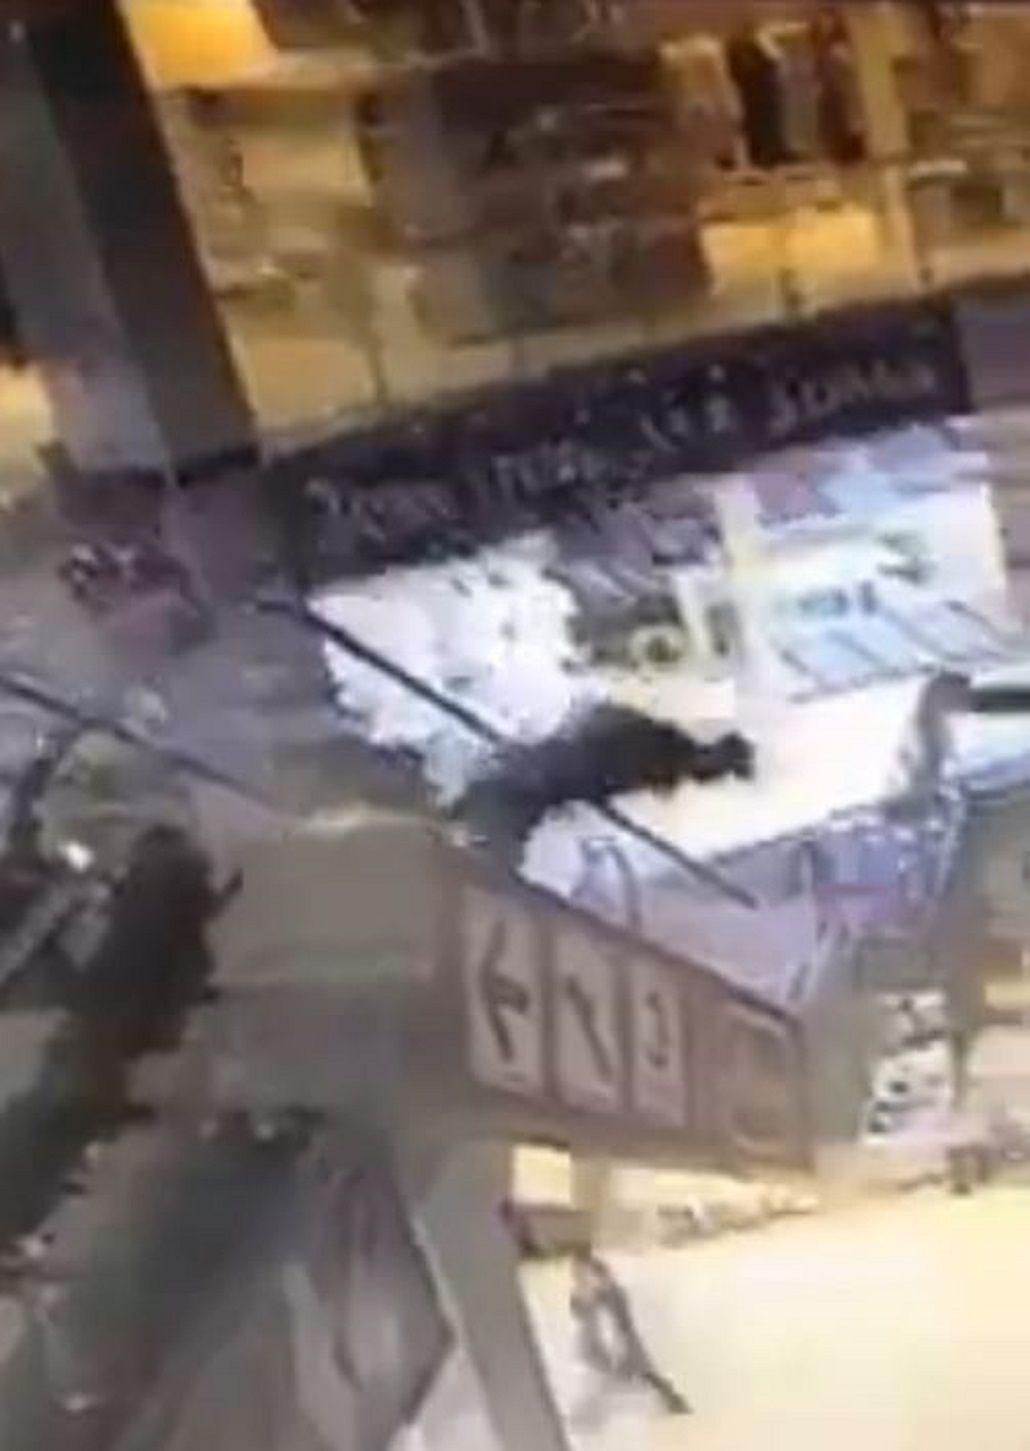 VIDEO: Murió después de caer de una escalera mecánica en un shopping